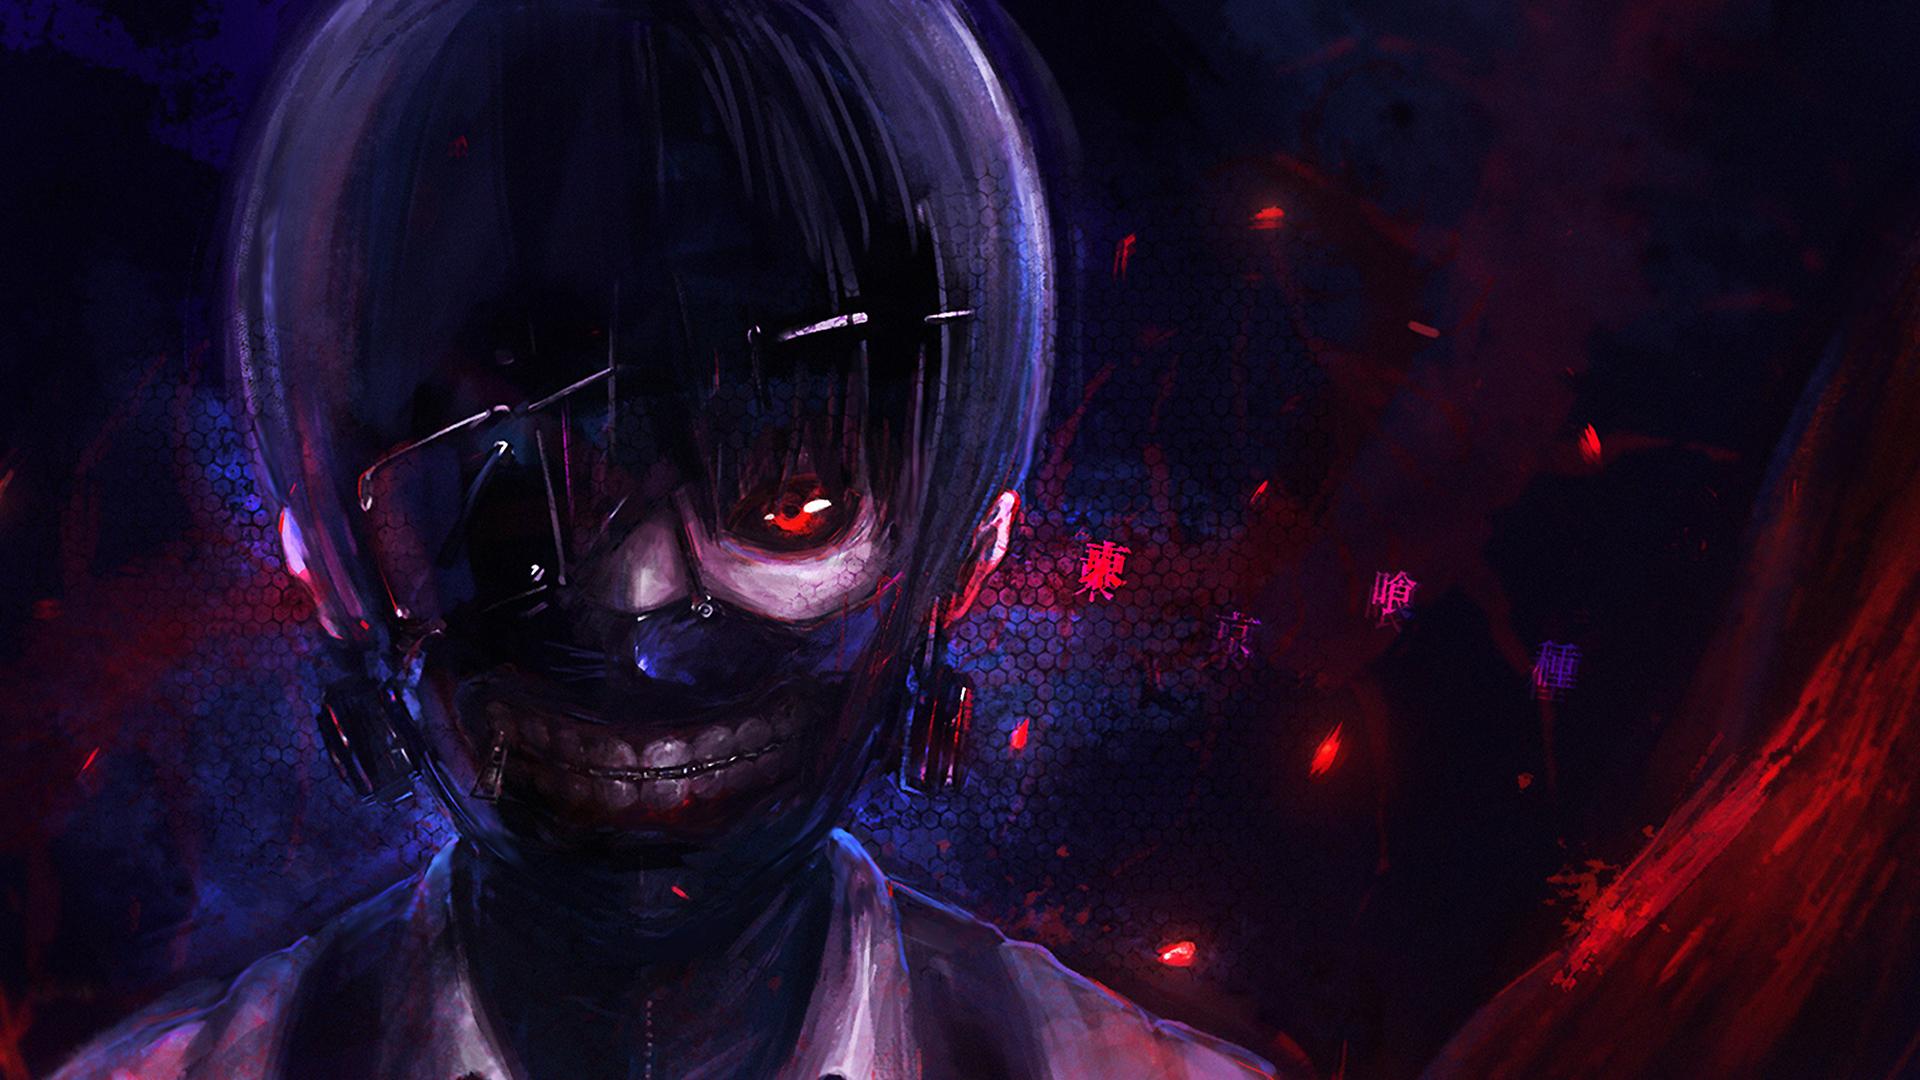 Tokyo ghoul full hd fondo de pantalla and fondo de escritorio 1920x1080 id 596838 - Ken hd wallpaper ...